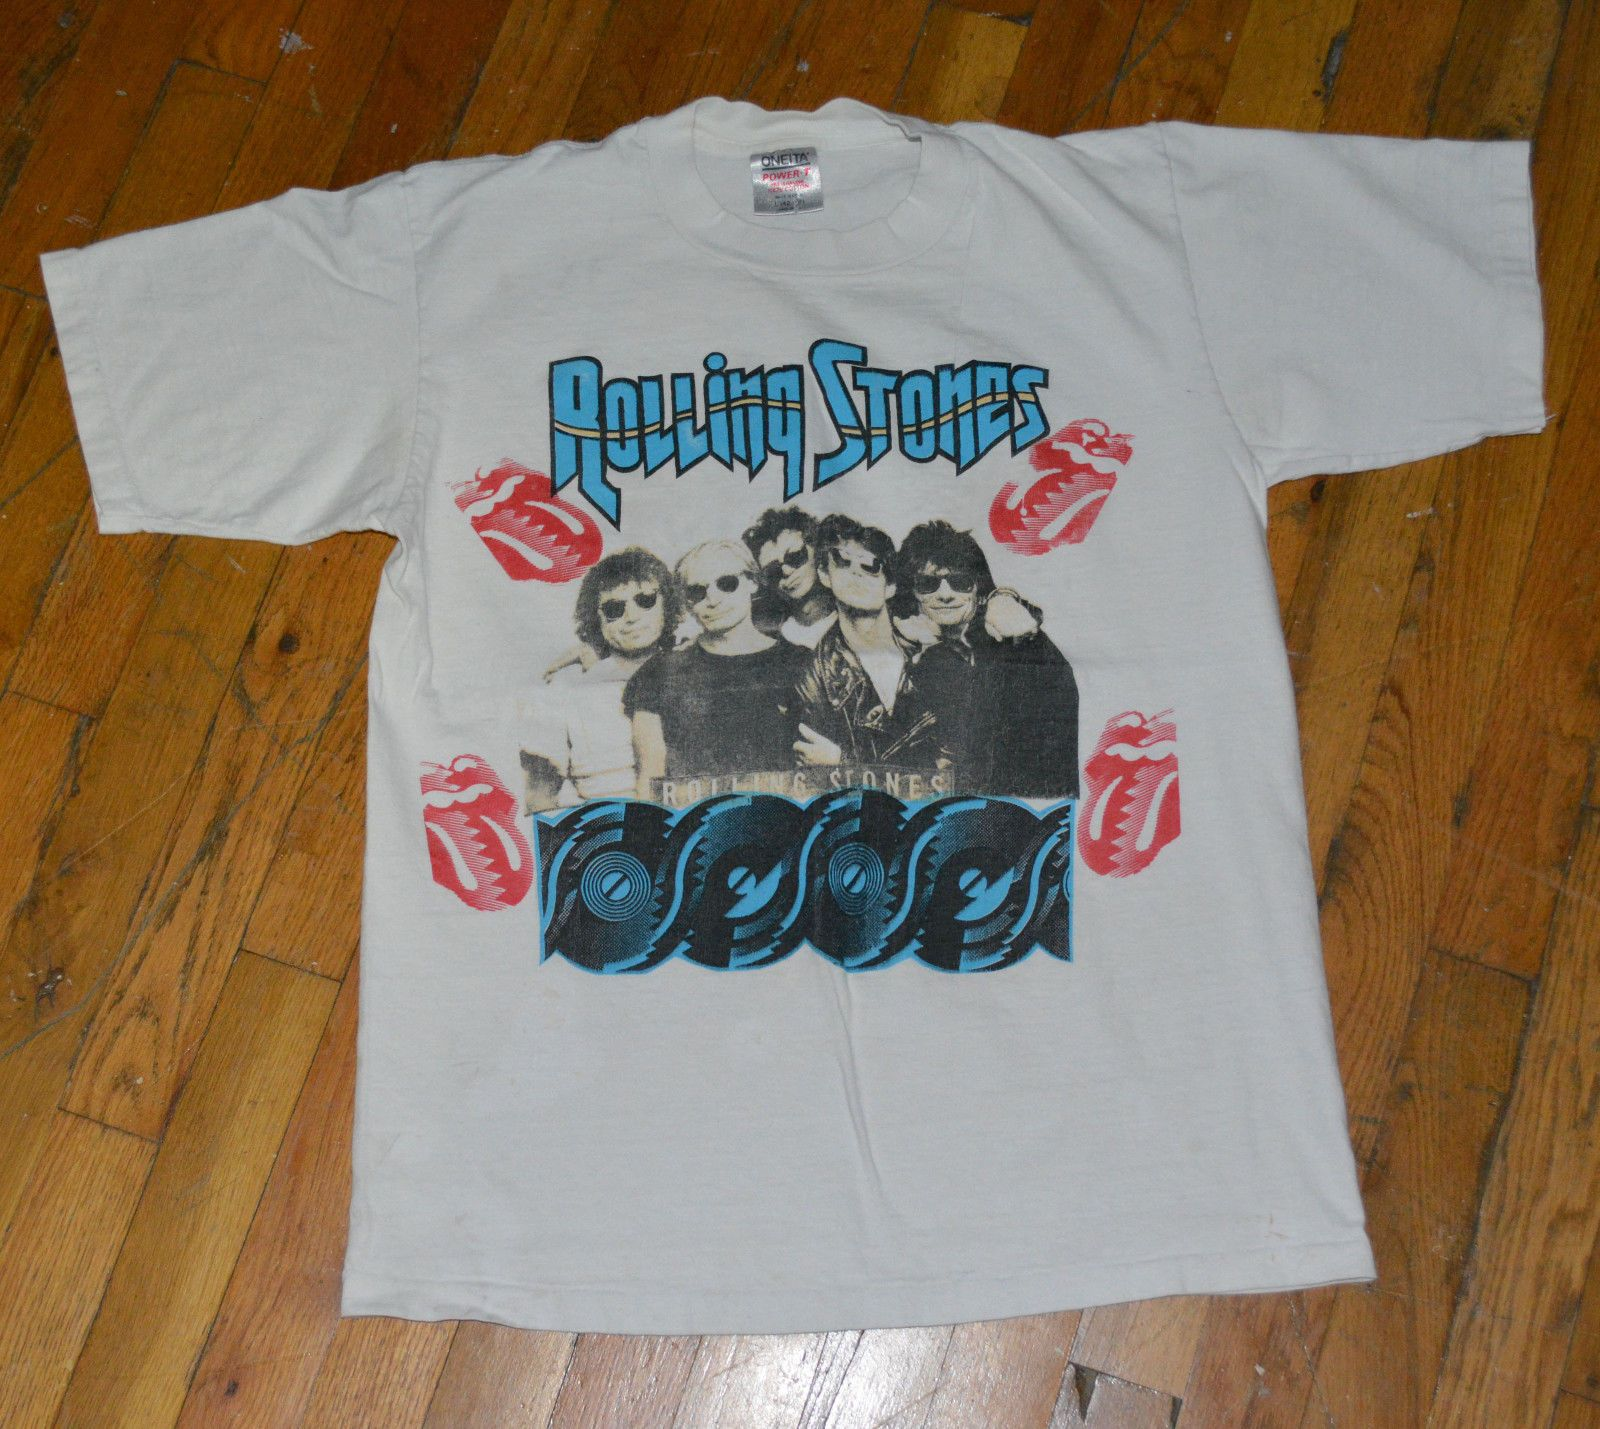 Vintage Crazy Pattern Shirt unisex M Boho Hippie Shirt Rare Original 80s 90s